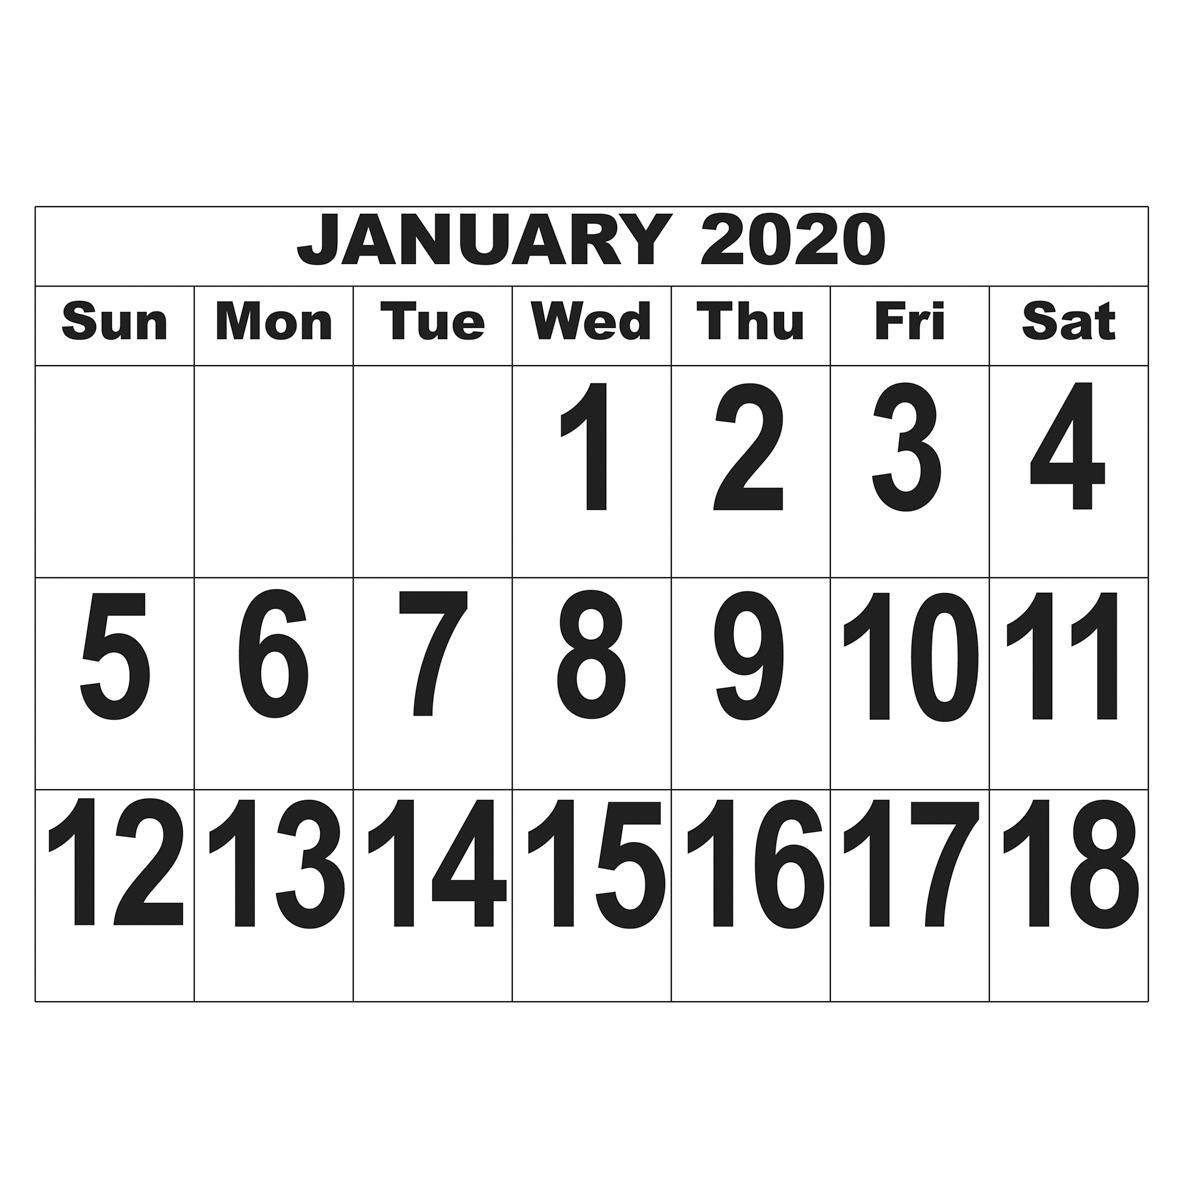 Giant Print Date Calendar  2020 with regard to Keyboard Calendar Strips 2020